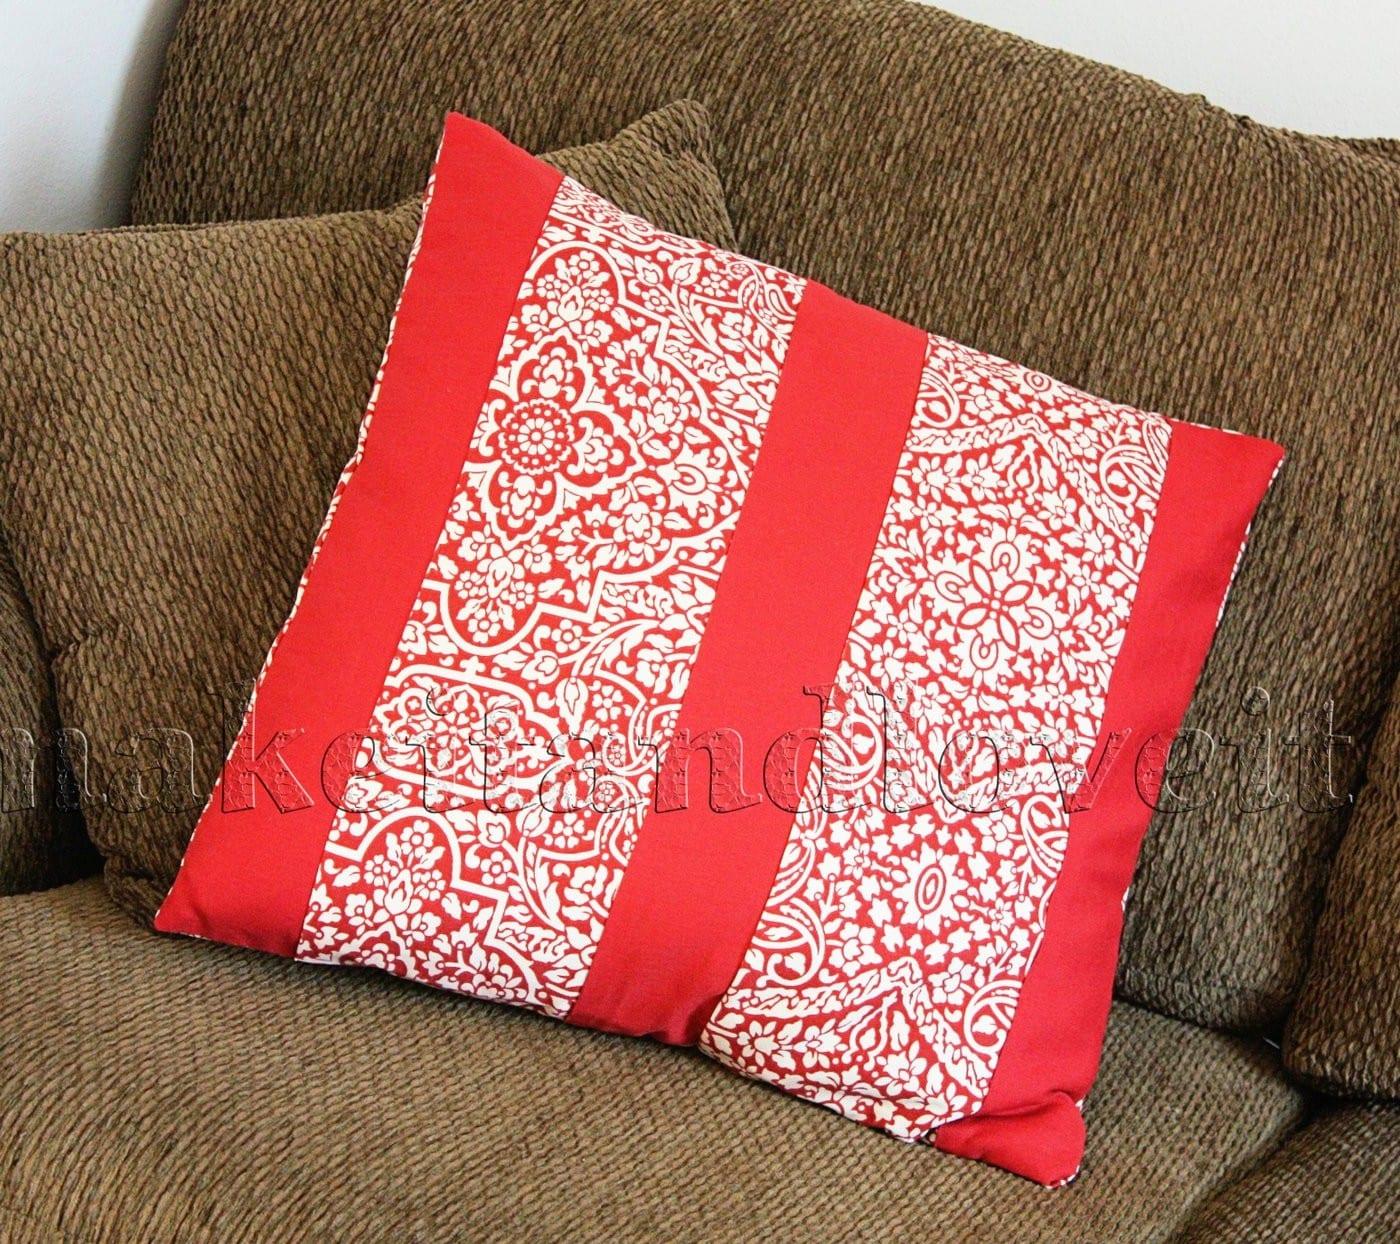 Pillow Slip Covers